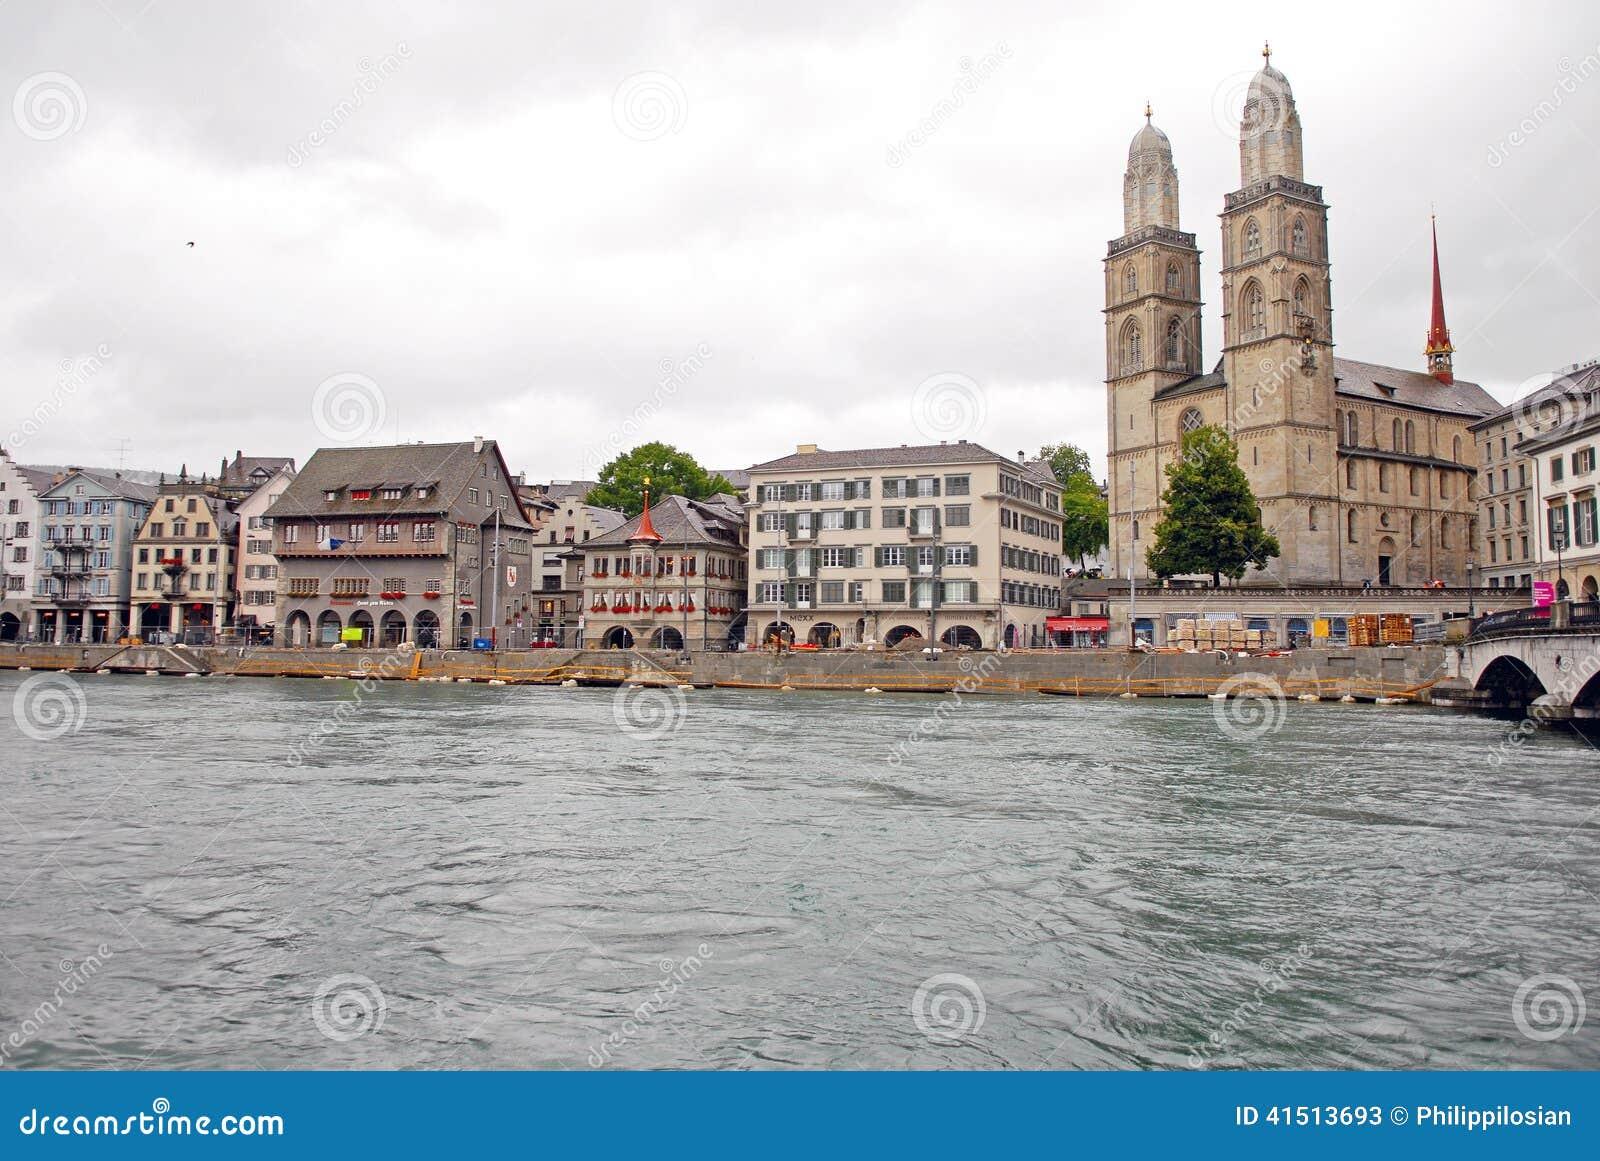 Cityscapesikt av den Grossmunster kyrkan i Zurich, Schweiz